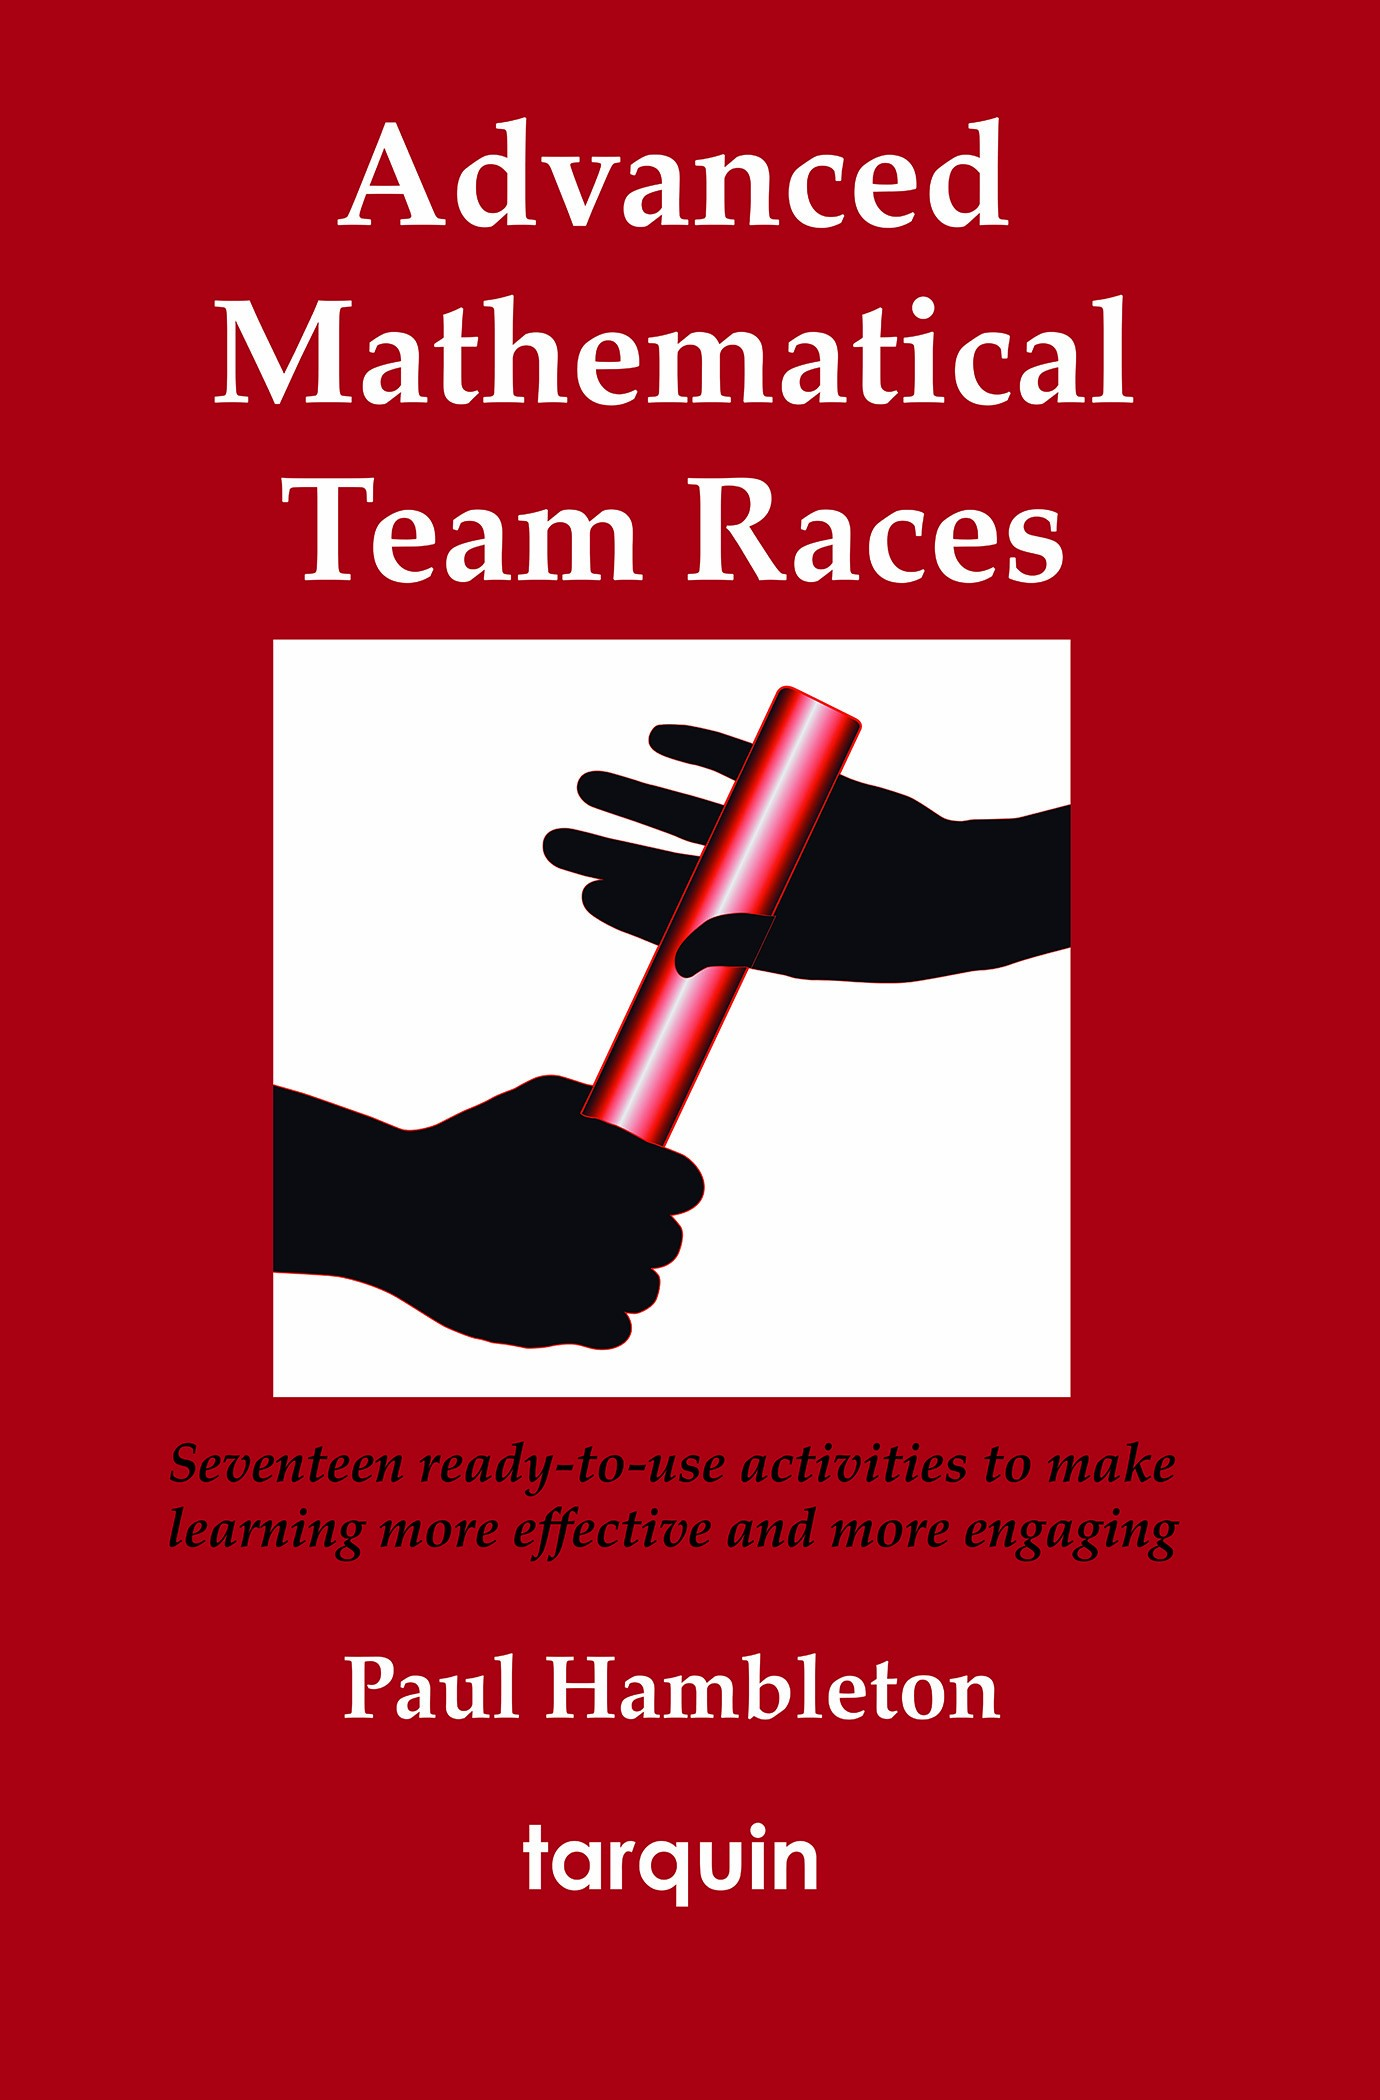 Advanced Mathematical Team Races